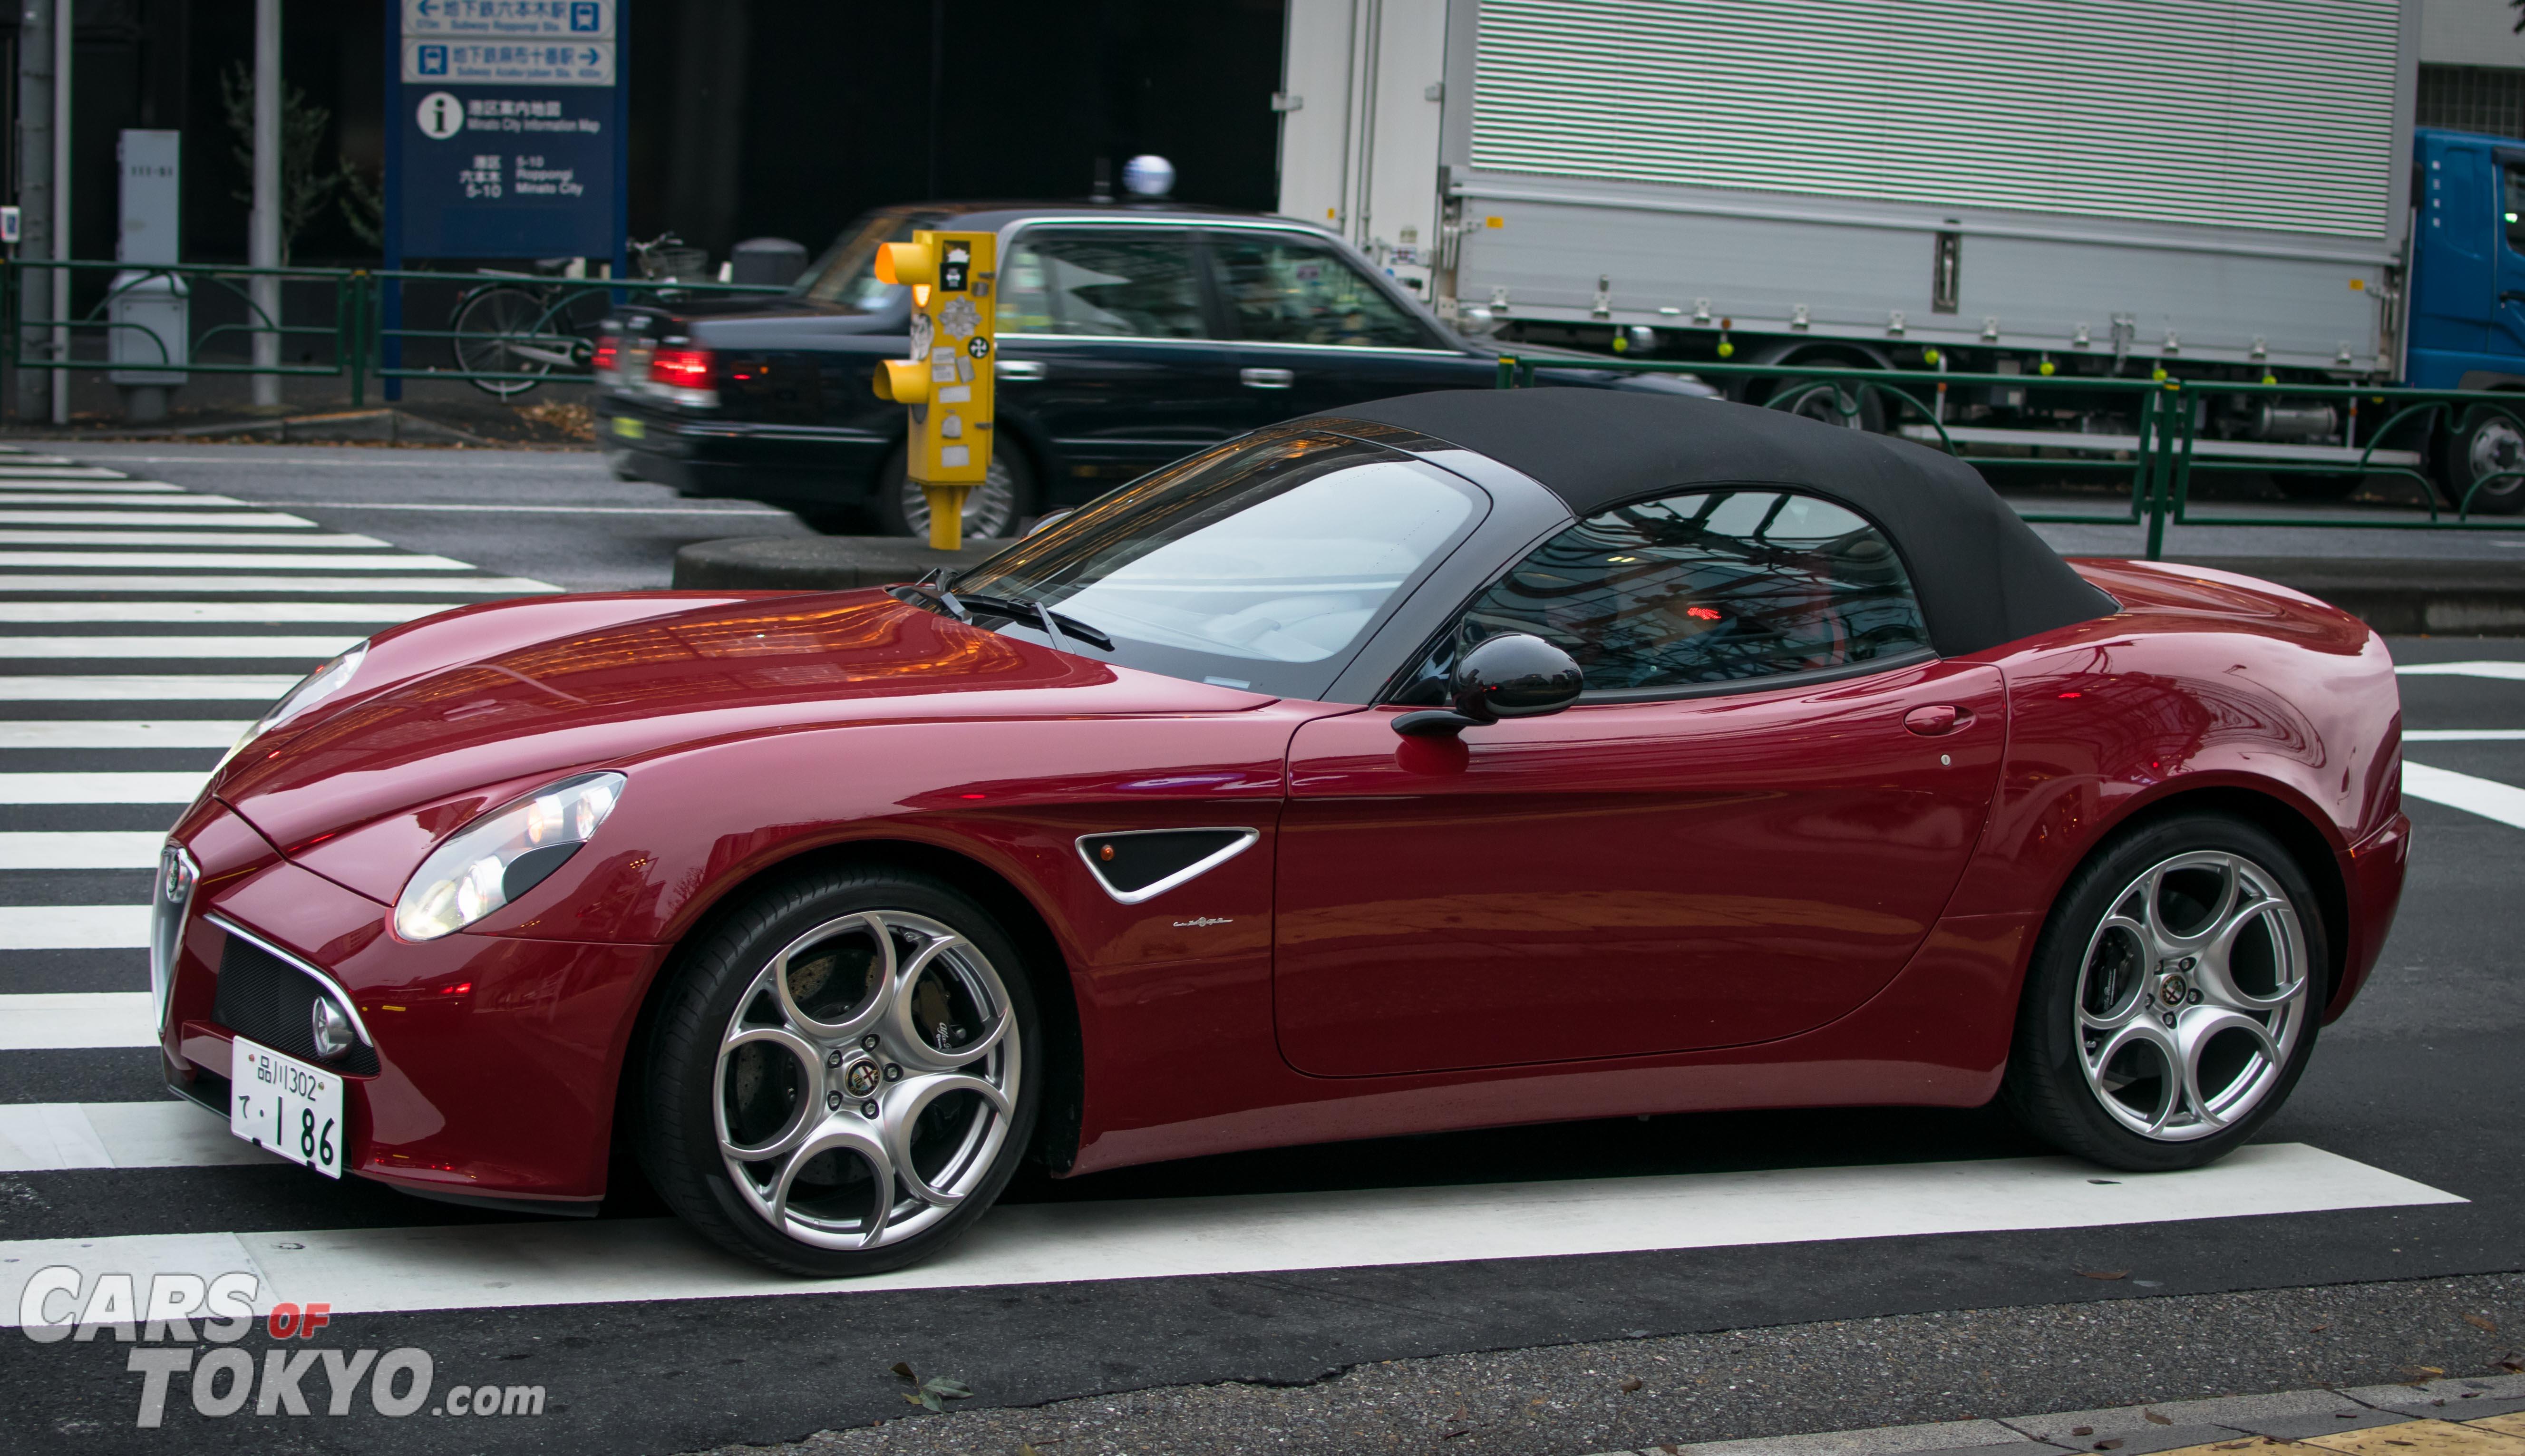 Cars of Tokyo Roppongi Alfa Romeo 8C Spider